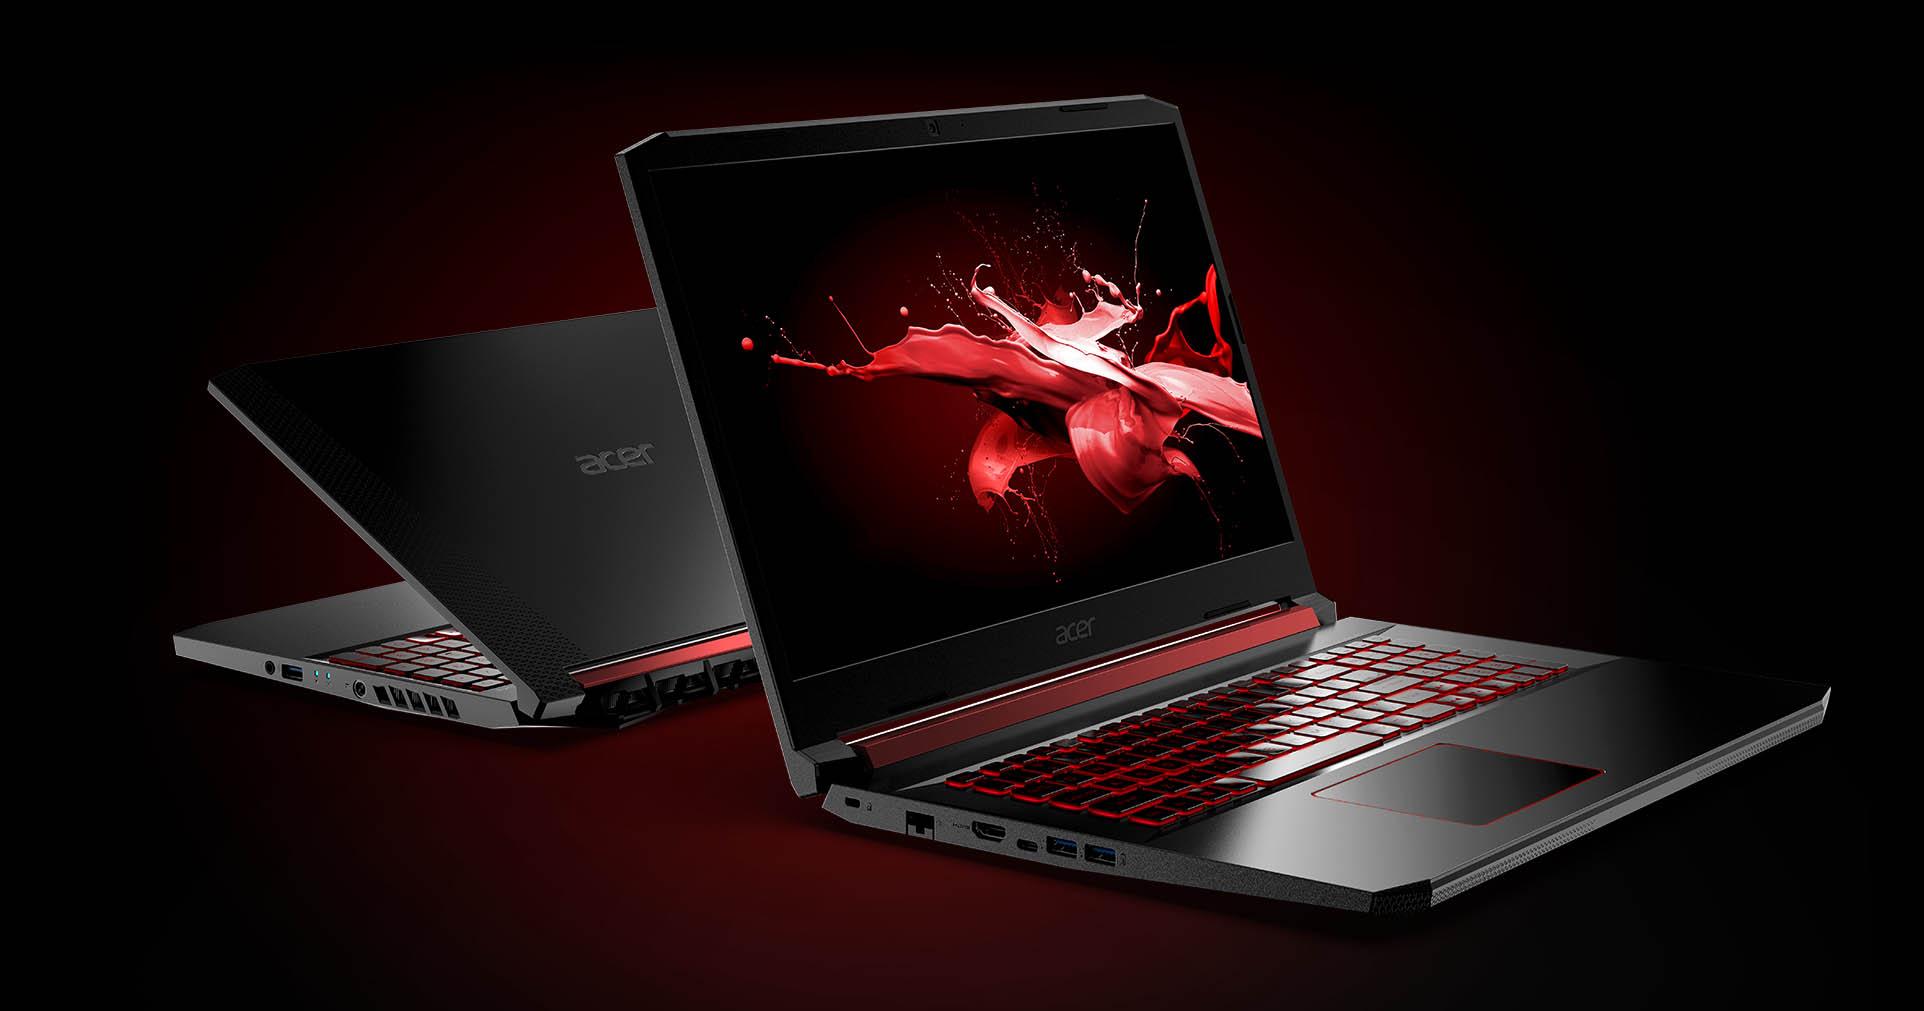 Acer เปิดตัวสุดยอดโน้ตบุ๊คเกมมิ่ง NewNitro5 ฮีโร่ที่มาพร้อมพลังอัพเกรดทรงพลังยิ่งกว่าเดิม ทั้ง CPU ใหม่ 9th Gen Intel Core i7, การ์ดจอใหม่ NVIDIA GeForce GTX 1660 Ti และหน้าจอความเร็วสูง 144Hz